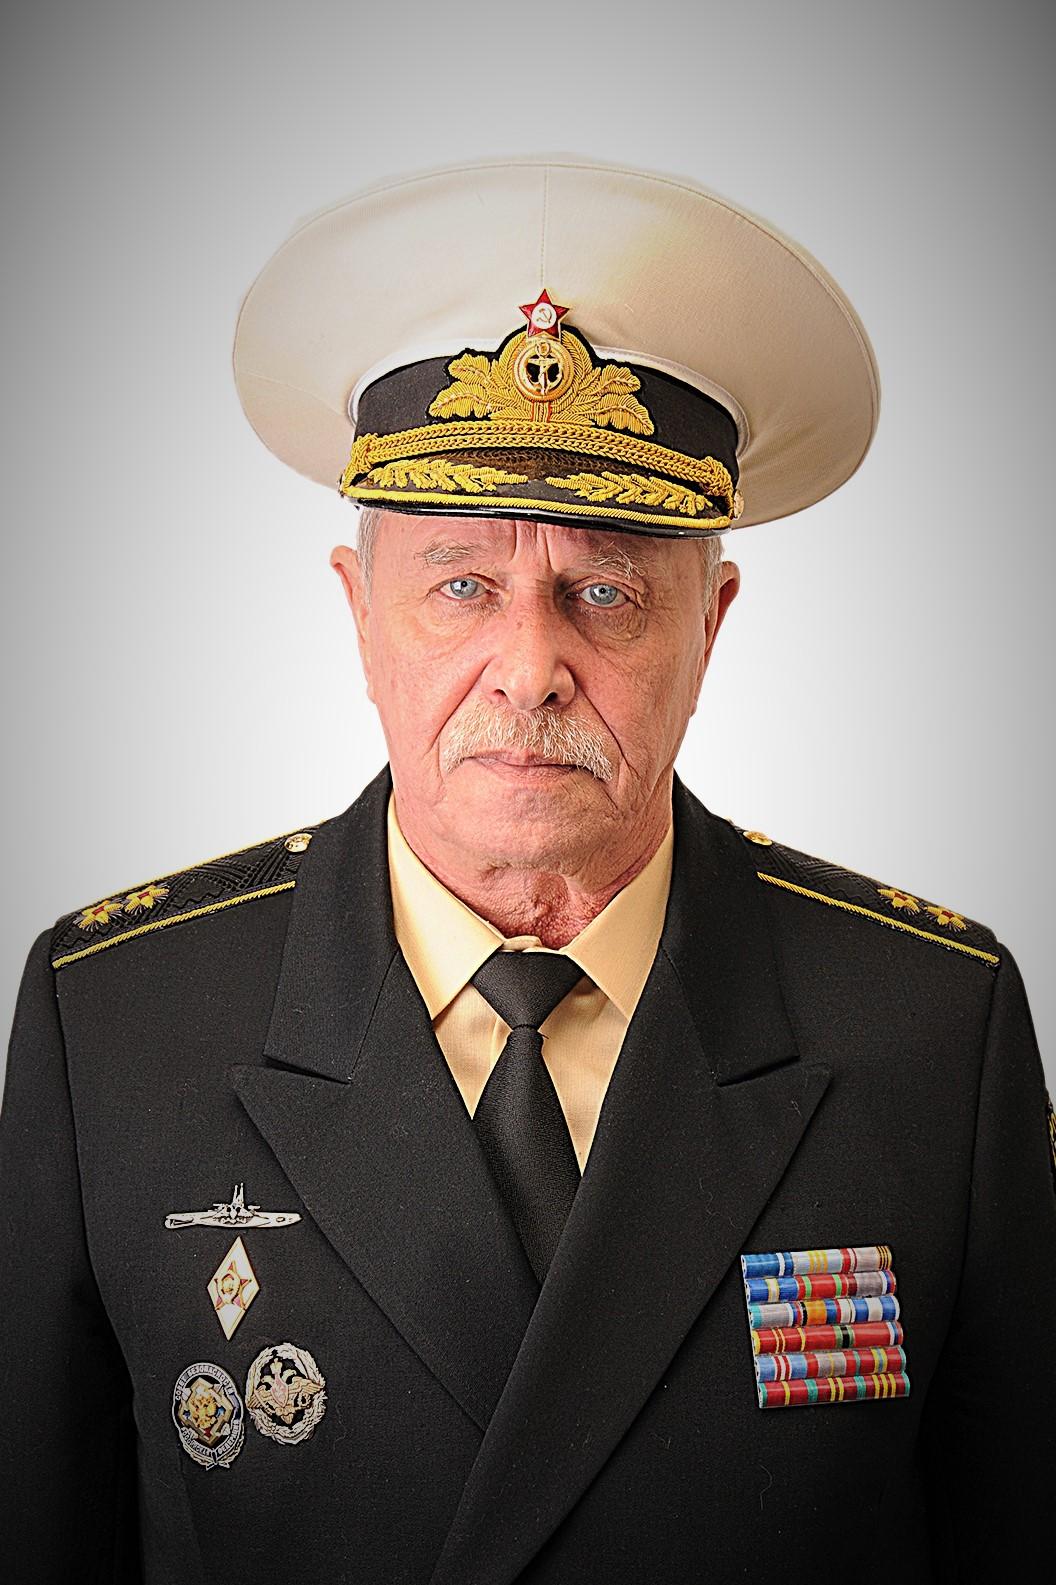 Вице-адмирал Кряжев Владимир Сергеевич